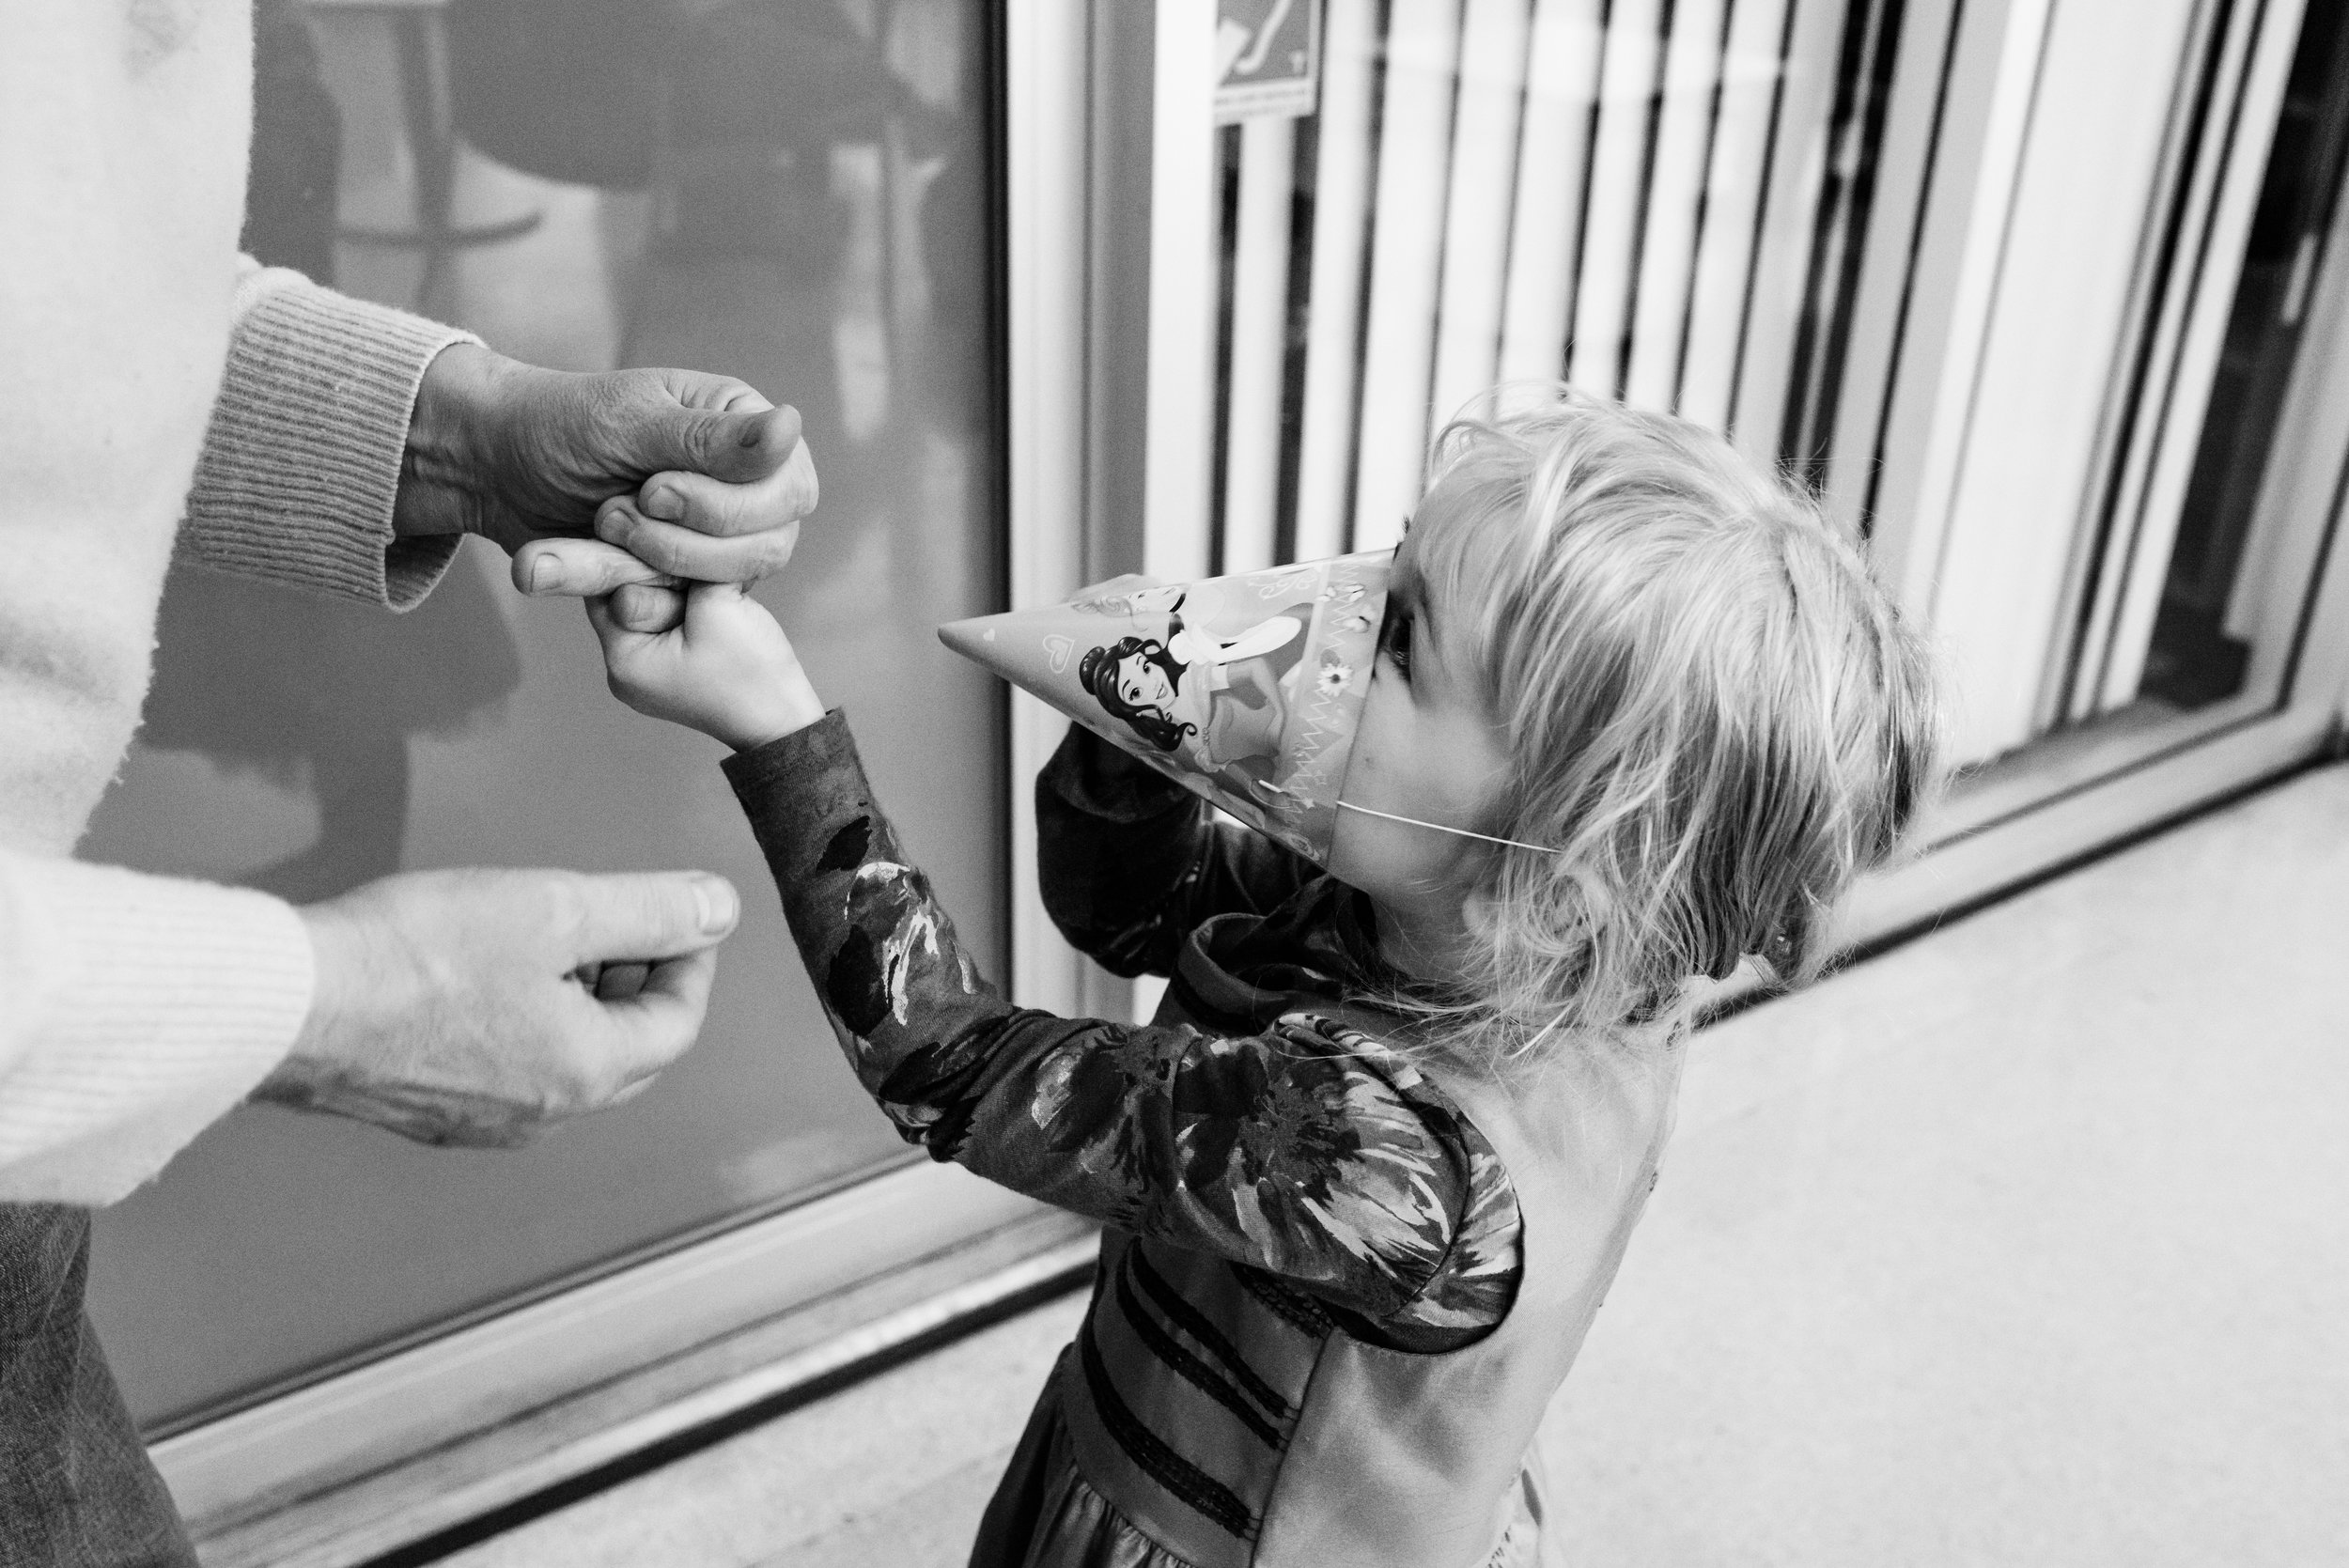 Nicola_Reiersen_Photography_Kids_Birthday_Pool_Party (64).jpg